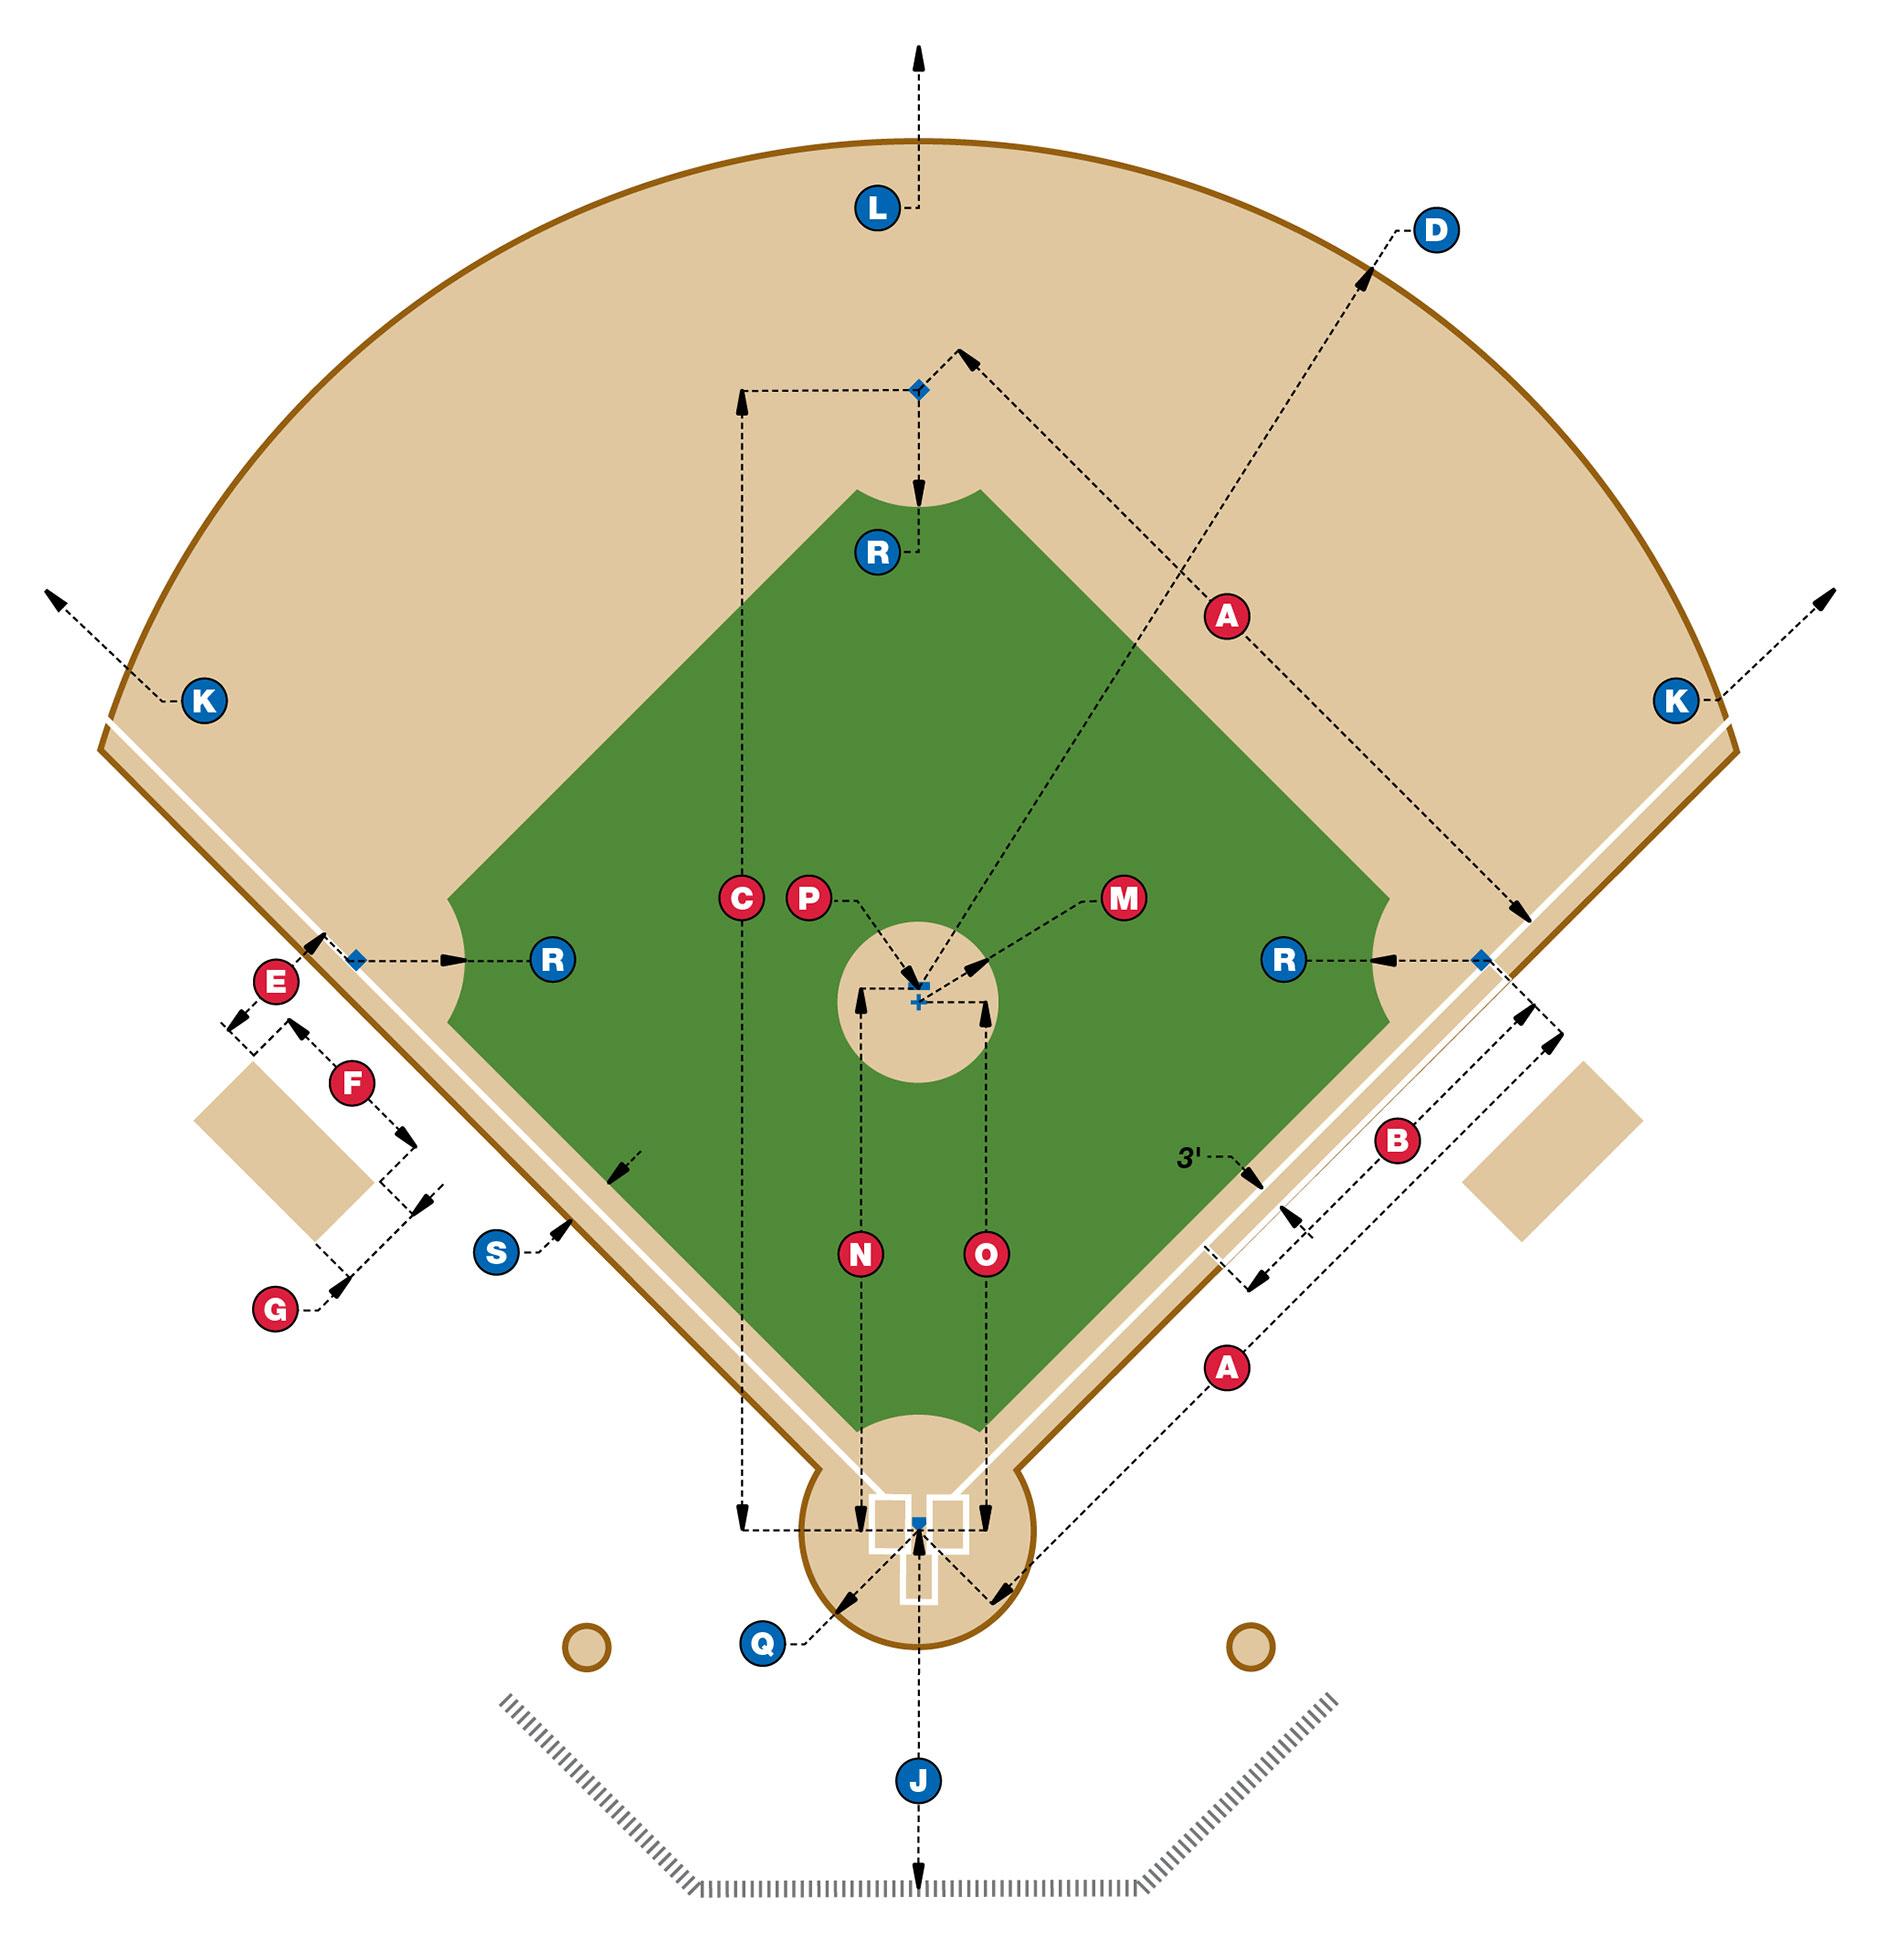 [Diagram of baseball field dimensions]